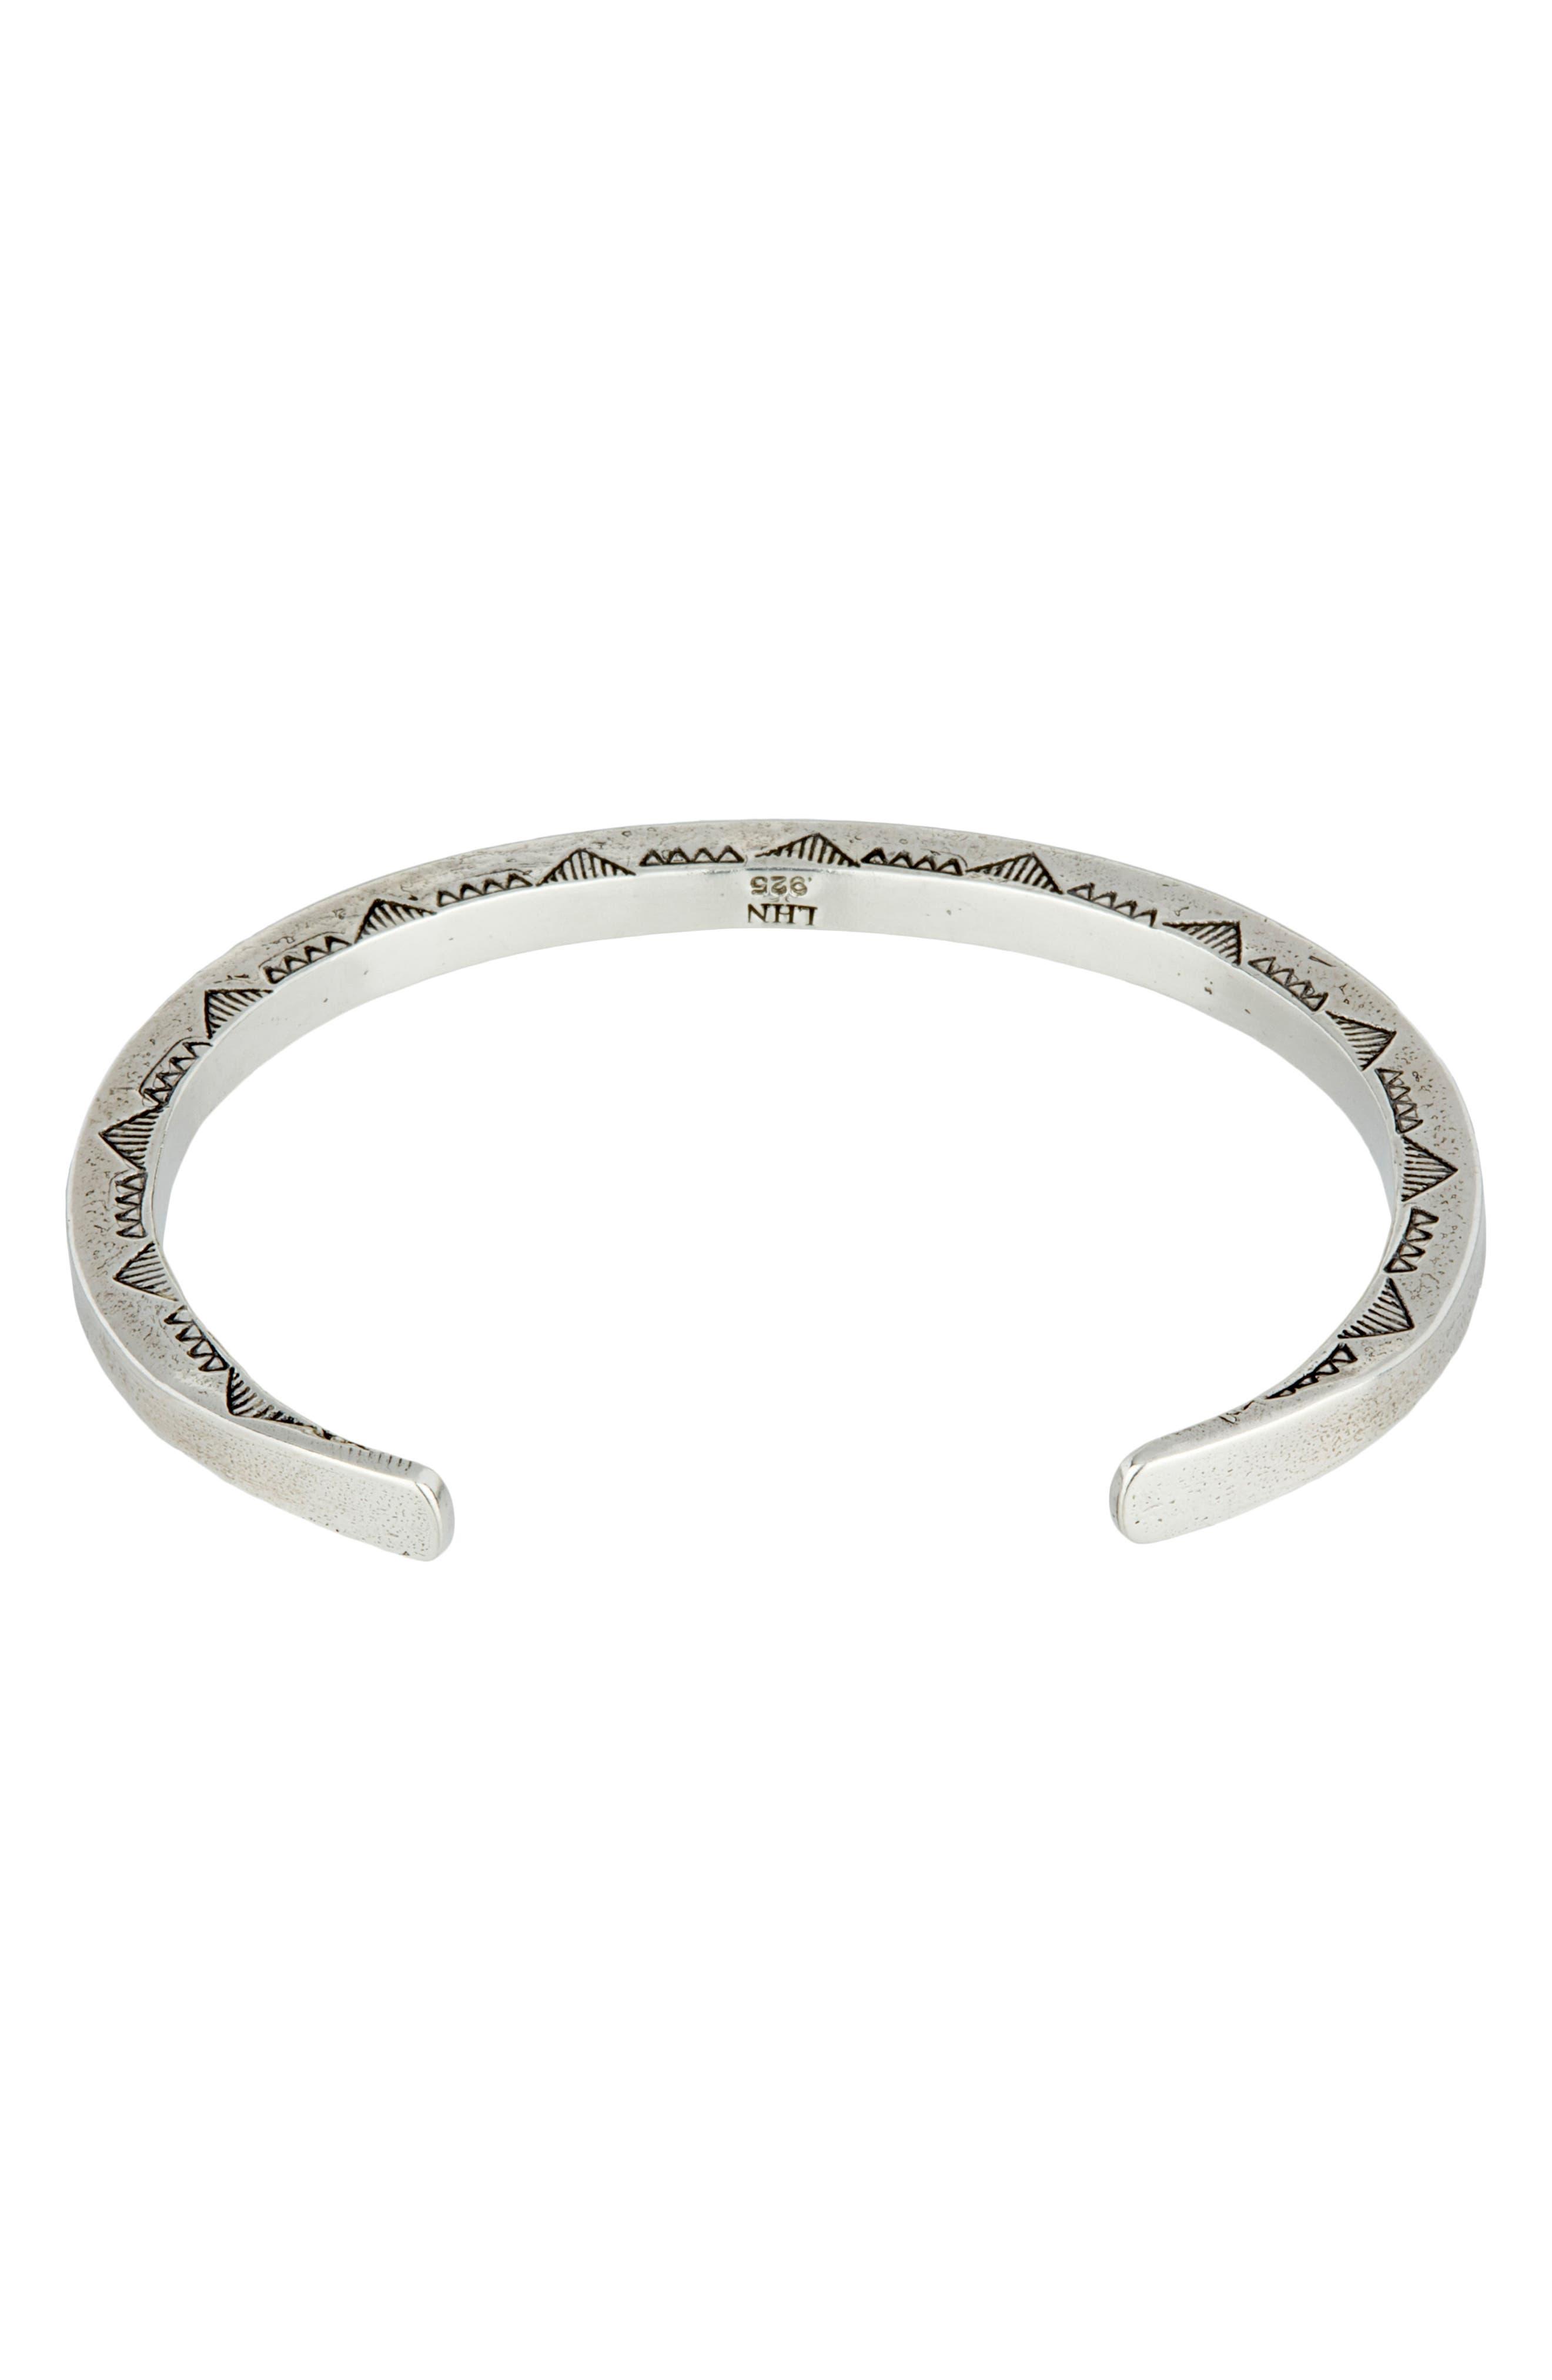 Sterling Silver Cuff Bracelet,                             Alternate thumbnail 2, color,